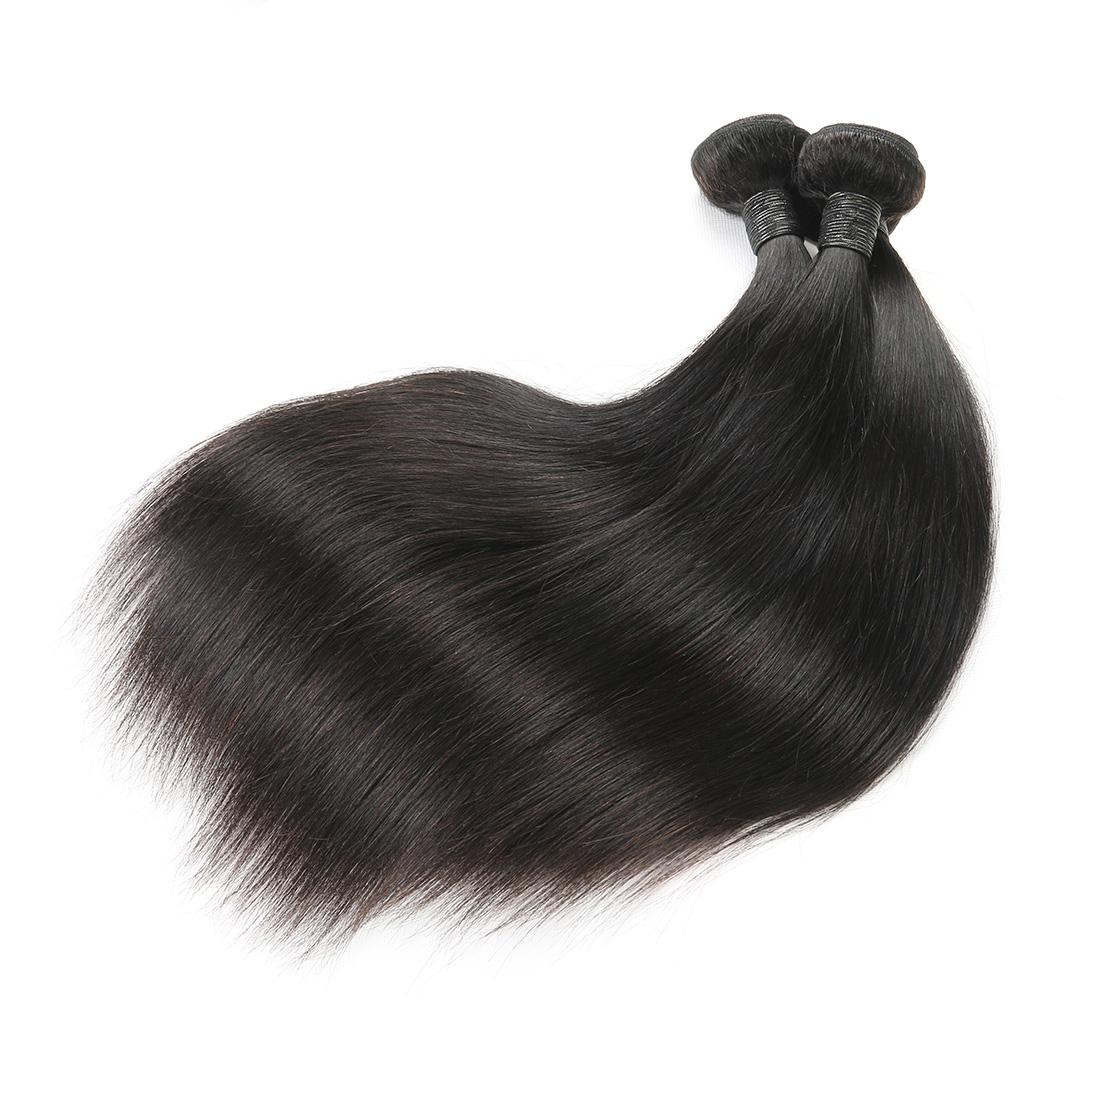 Wholesale Virgin hair Vendors Cuticle Aligned Bundles Hair Extension,10A Mink Raw Brazilian Virgin Human wholesale hair bundles фото